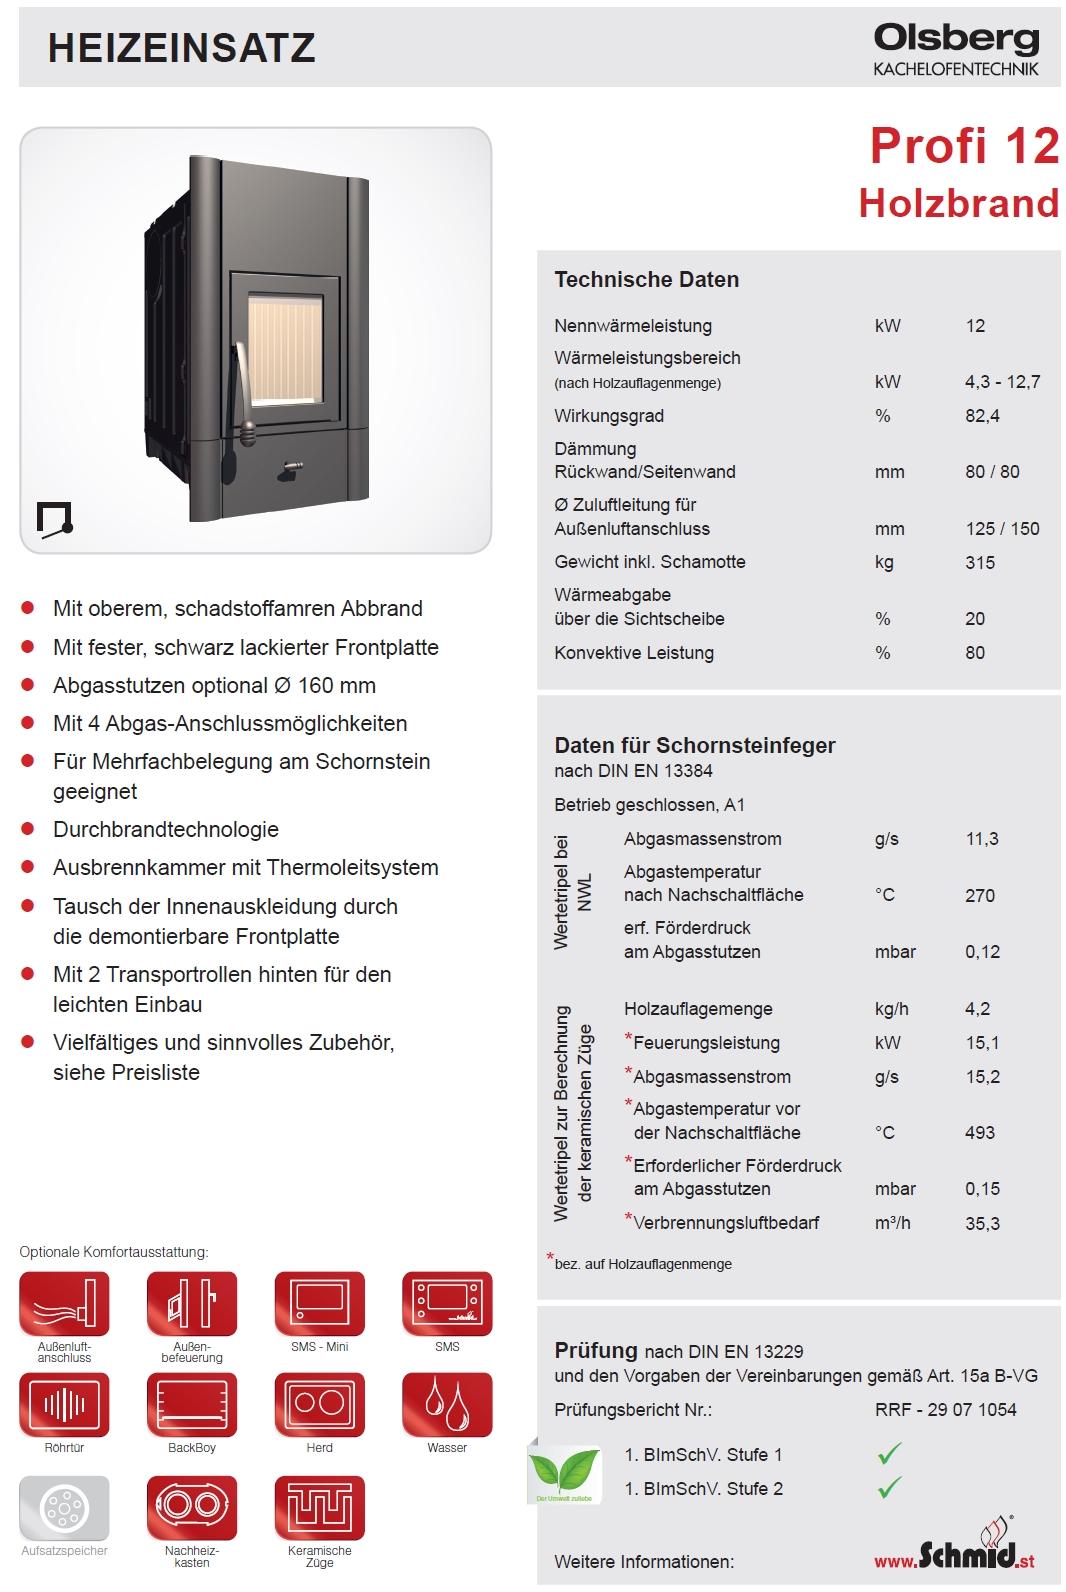 olsberg kachelofeneinsatz profi 12 kw kamineinsatz. Black Bedroom Furniture Sets. Home Design Ideas